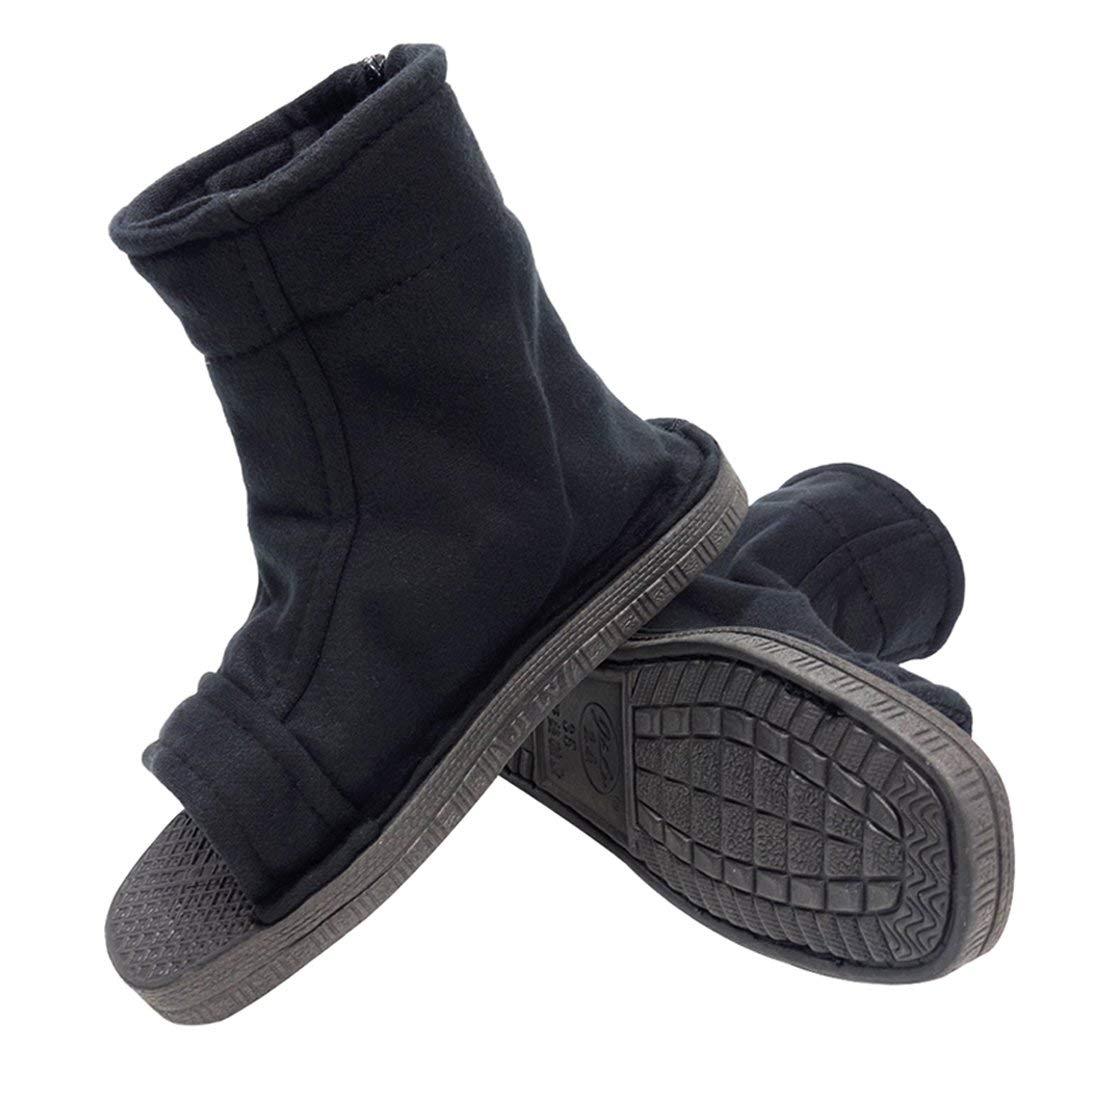 DAZCOS Negro Shippuden Ninja Zapatos US 5 - Nosotros 11 ...